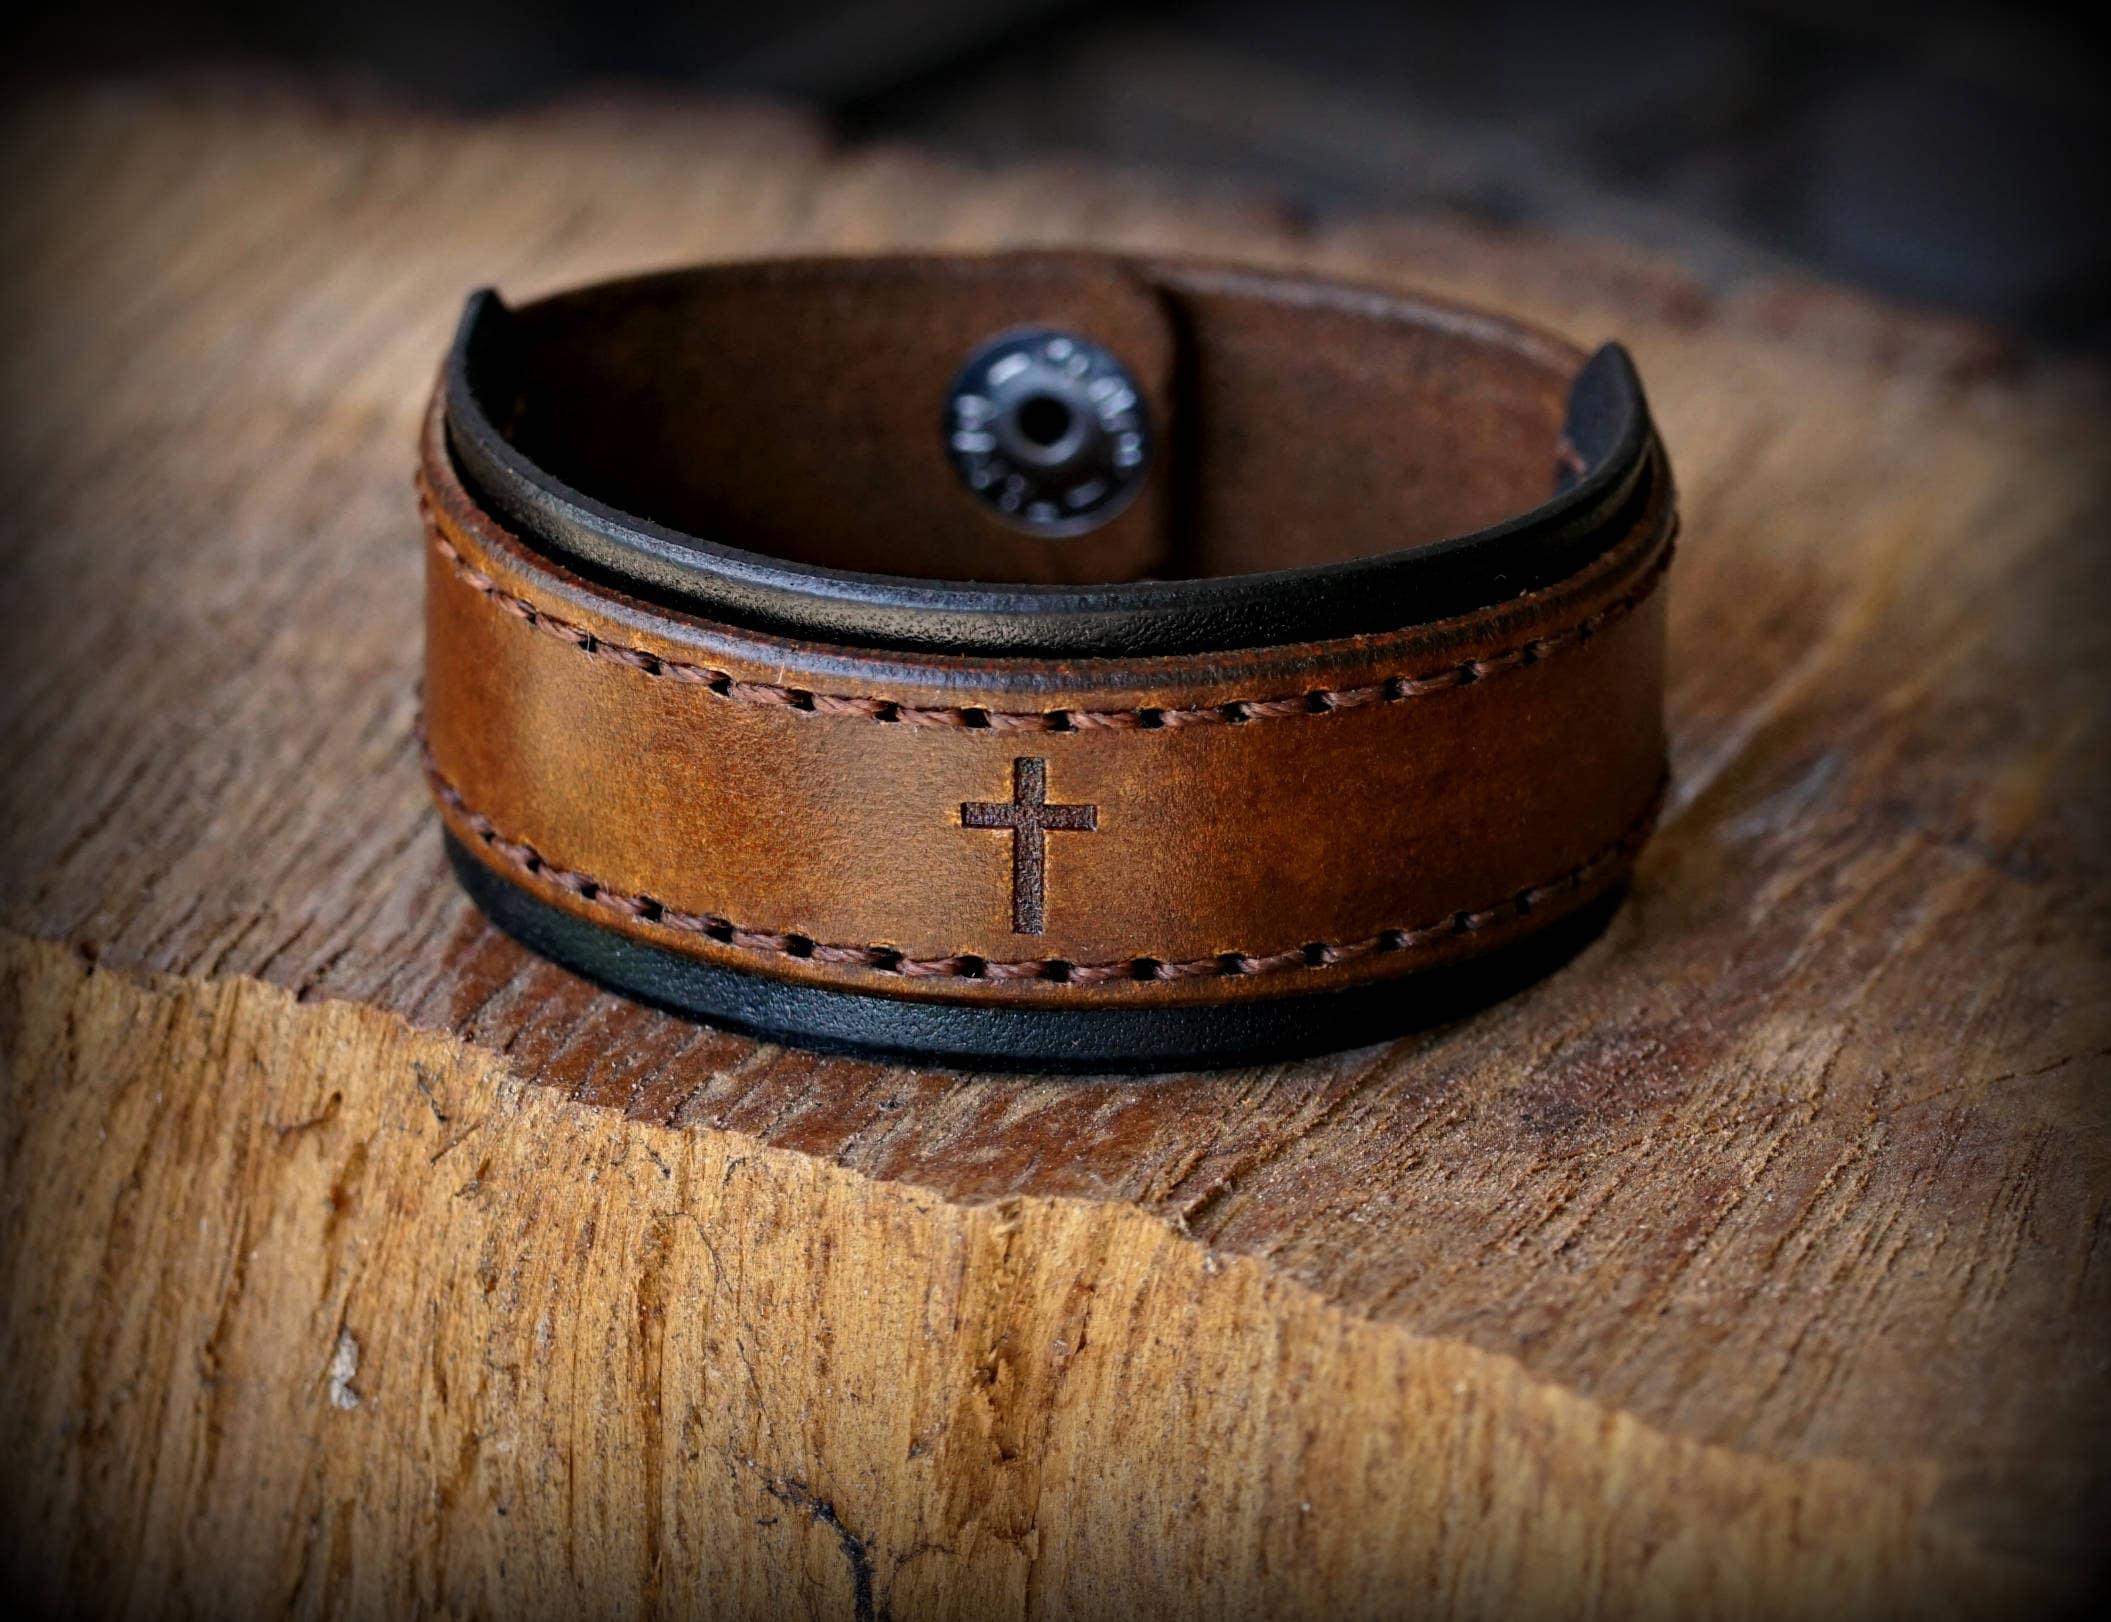 456a10fd72e329 Personalized Leather Bracelet, Women's Leather Bracelet, Men's ...